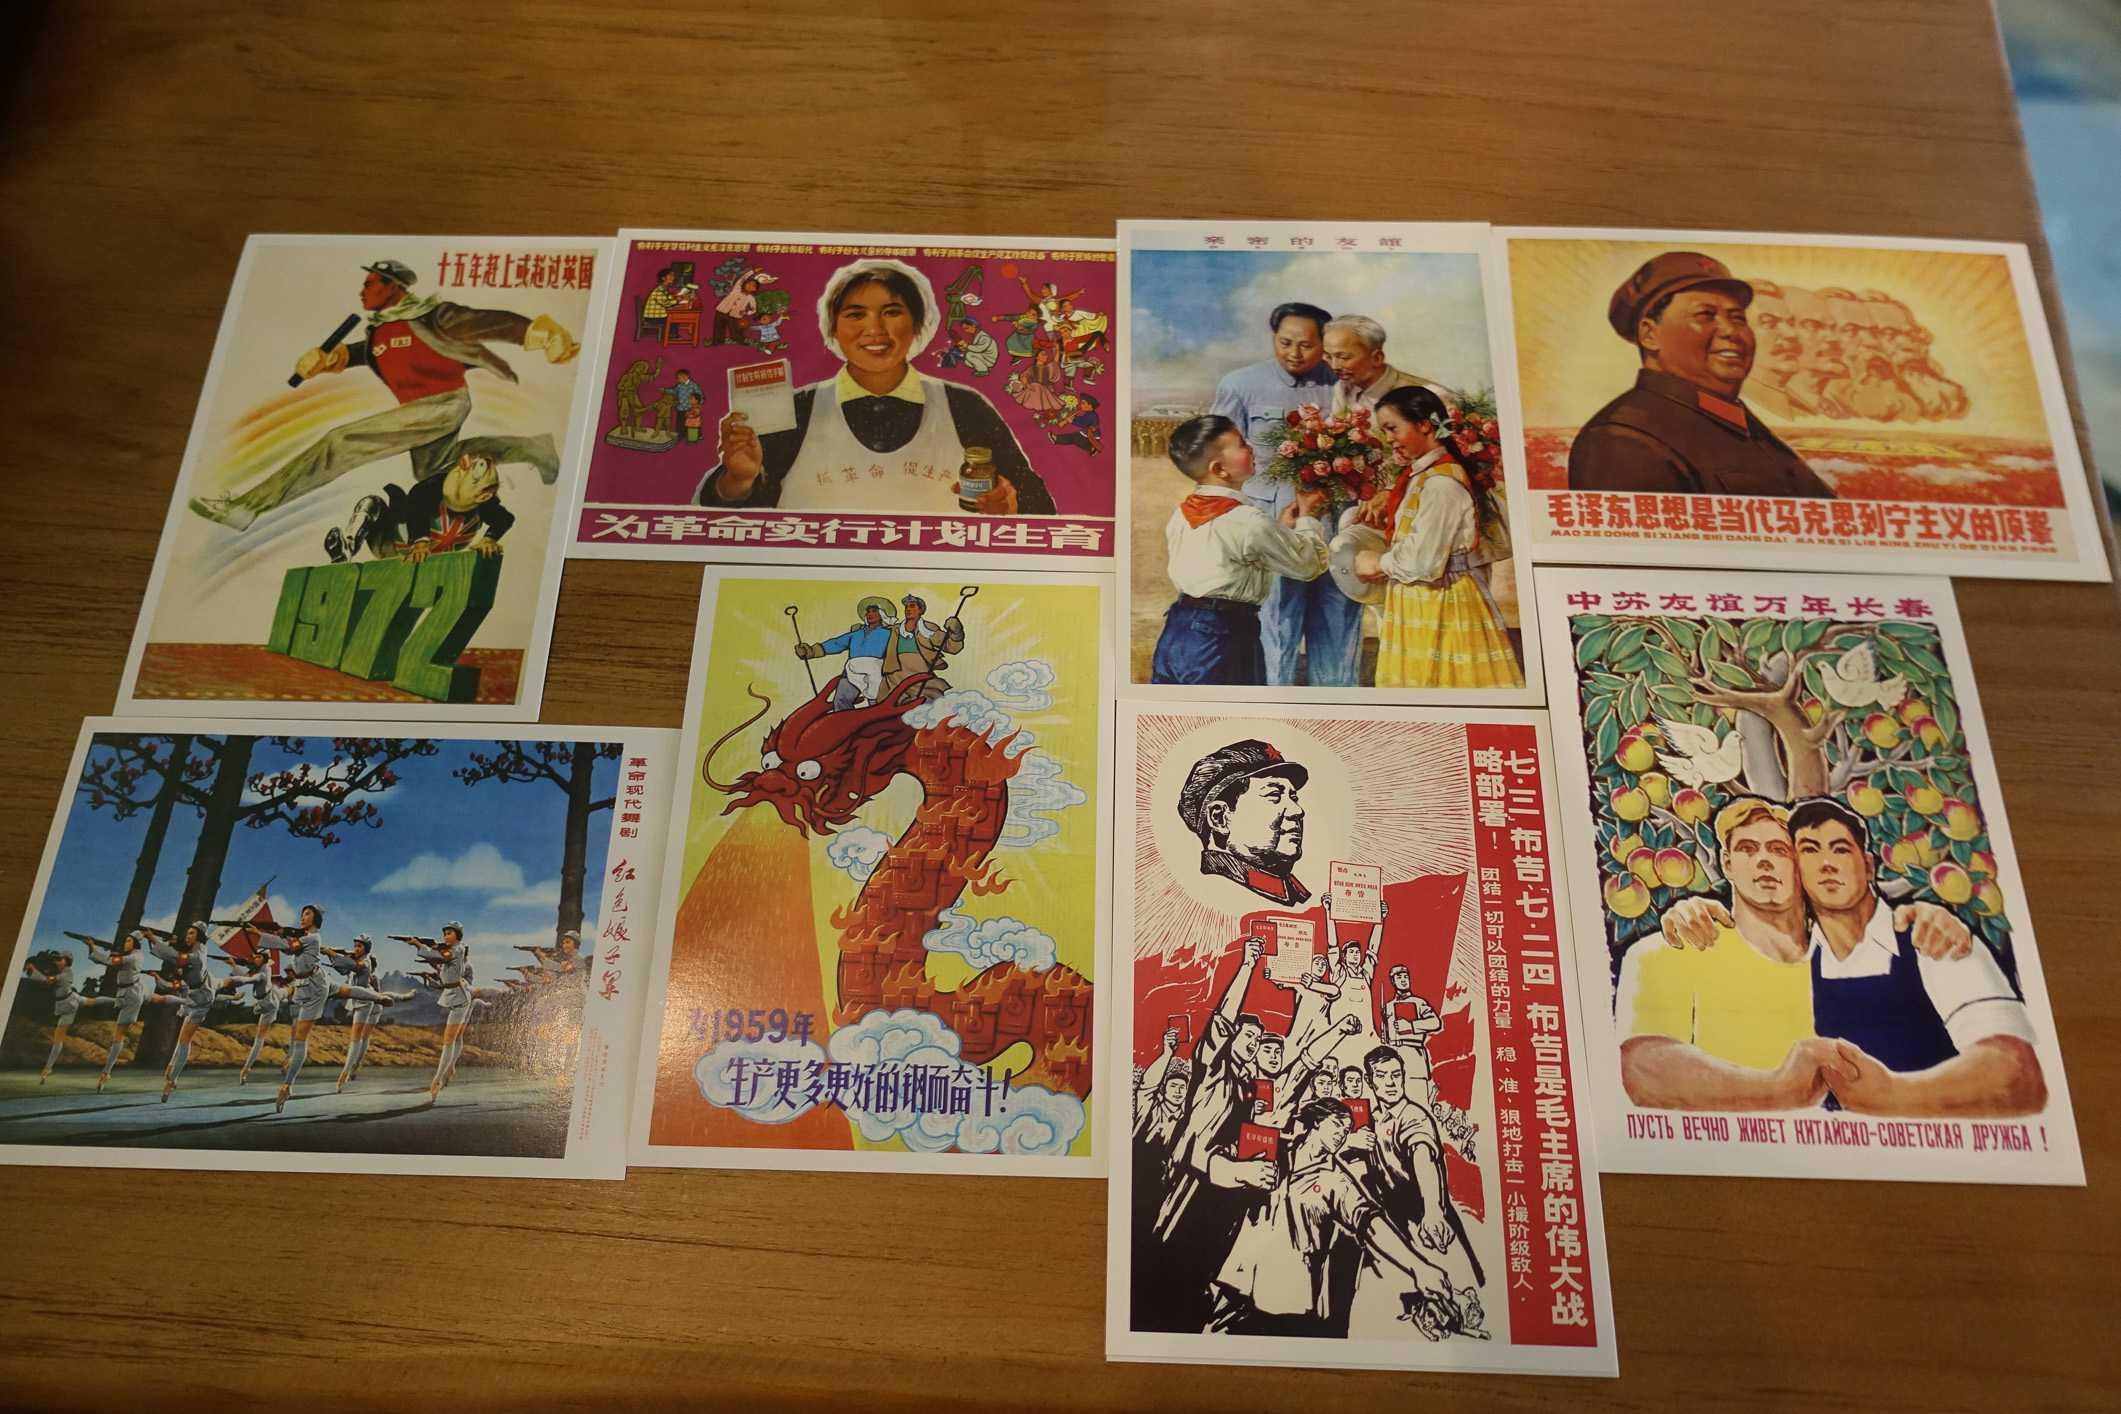 Postcards from Shanghai Propaganda Poster Museum